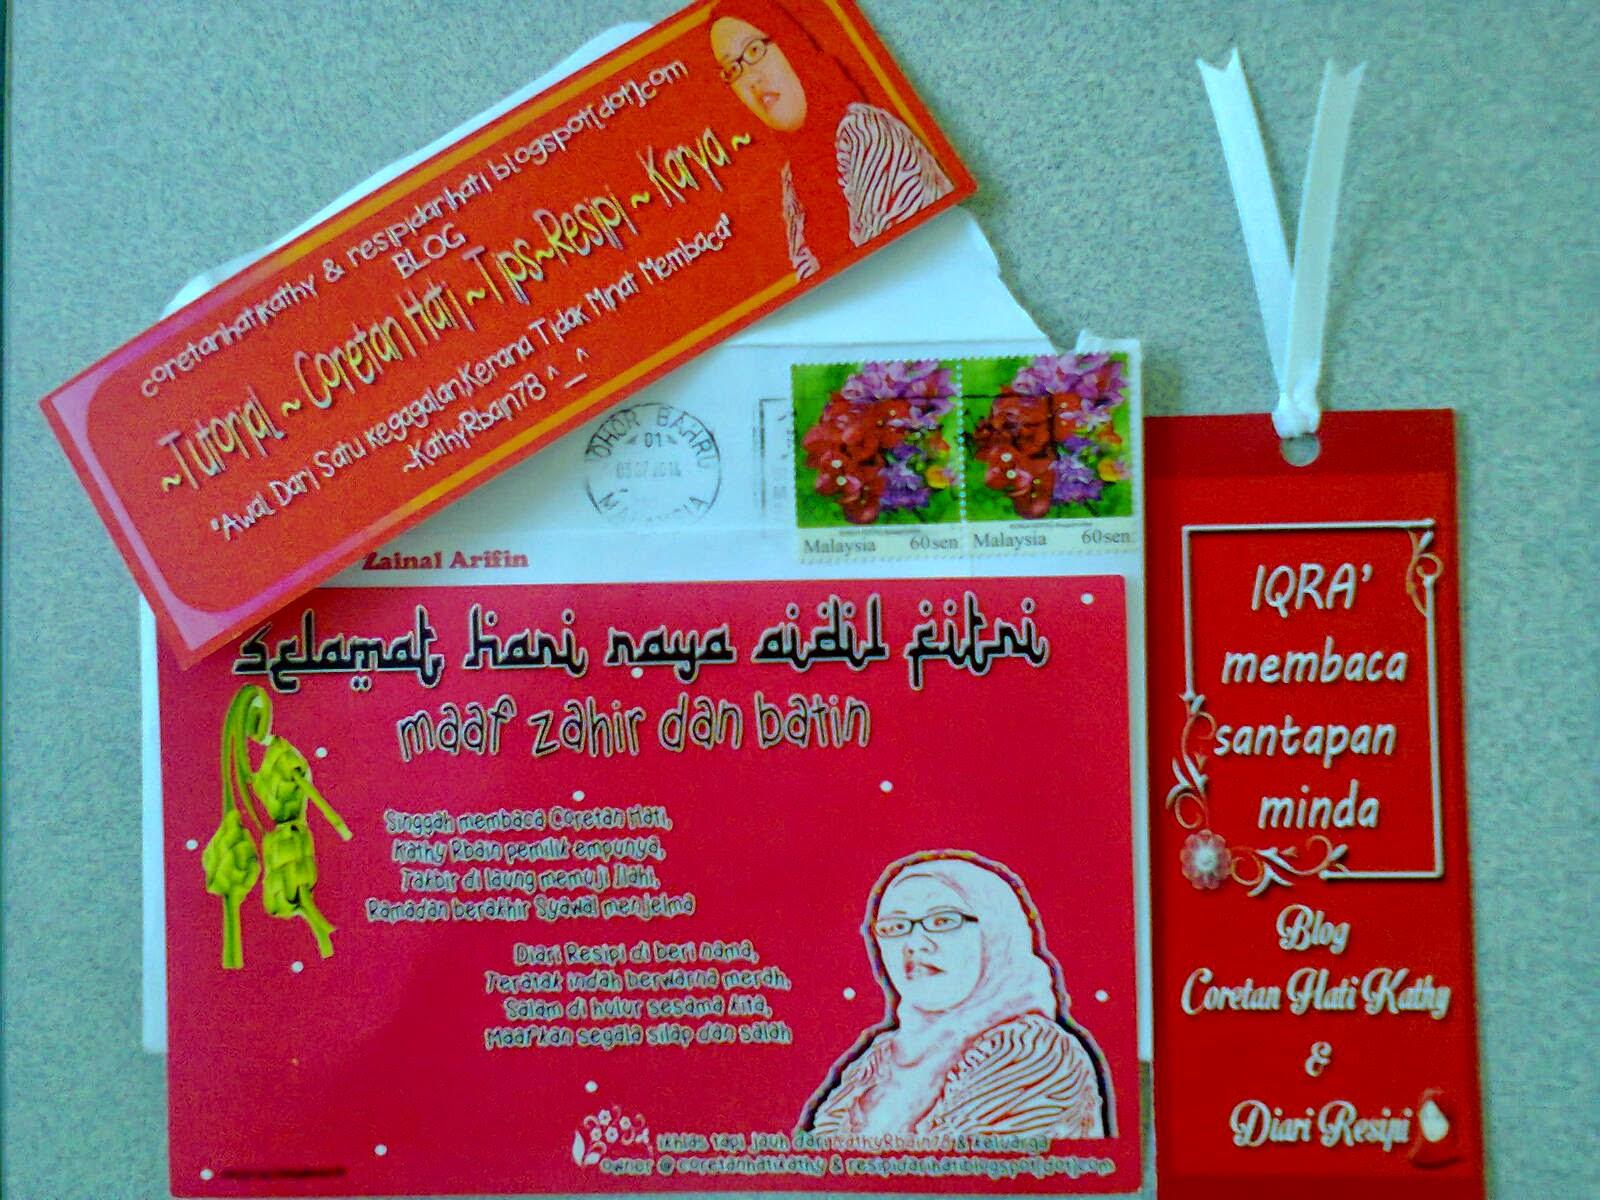 Kartu Lebaran Dari Malaysia Kathy R'bain